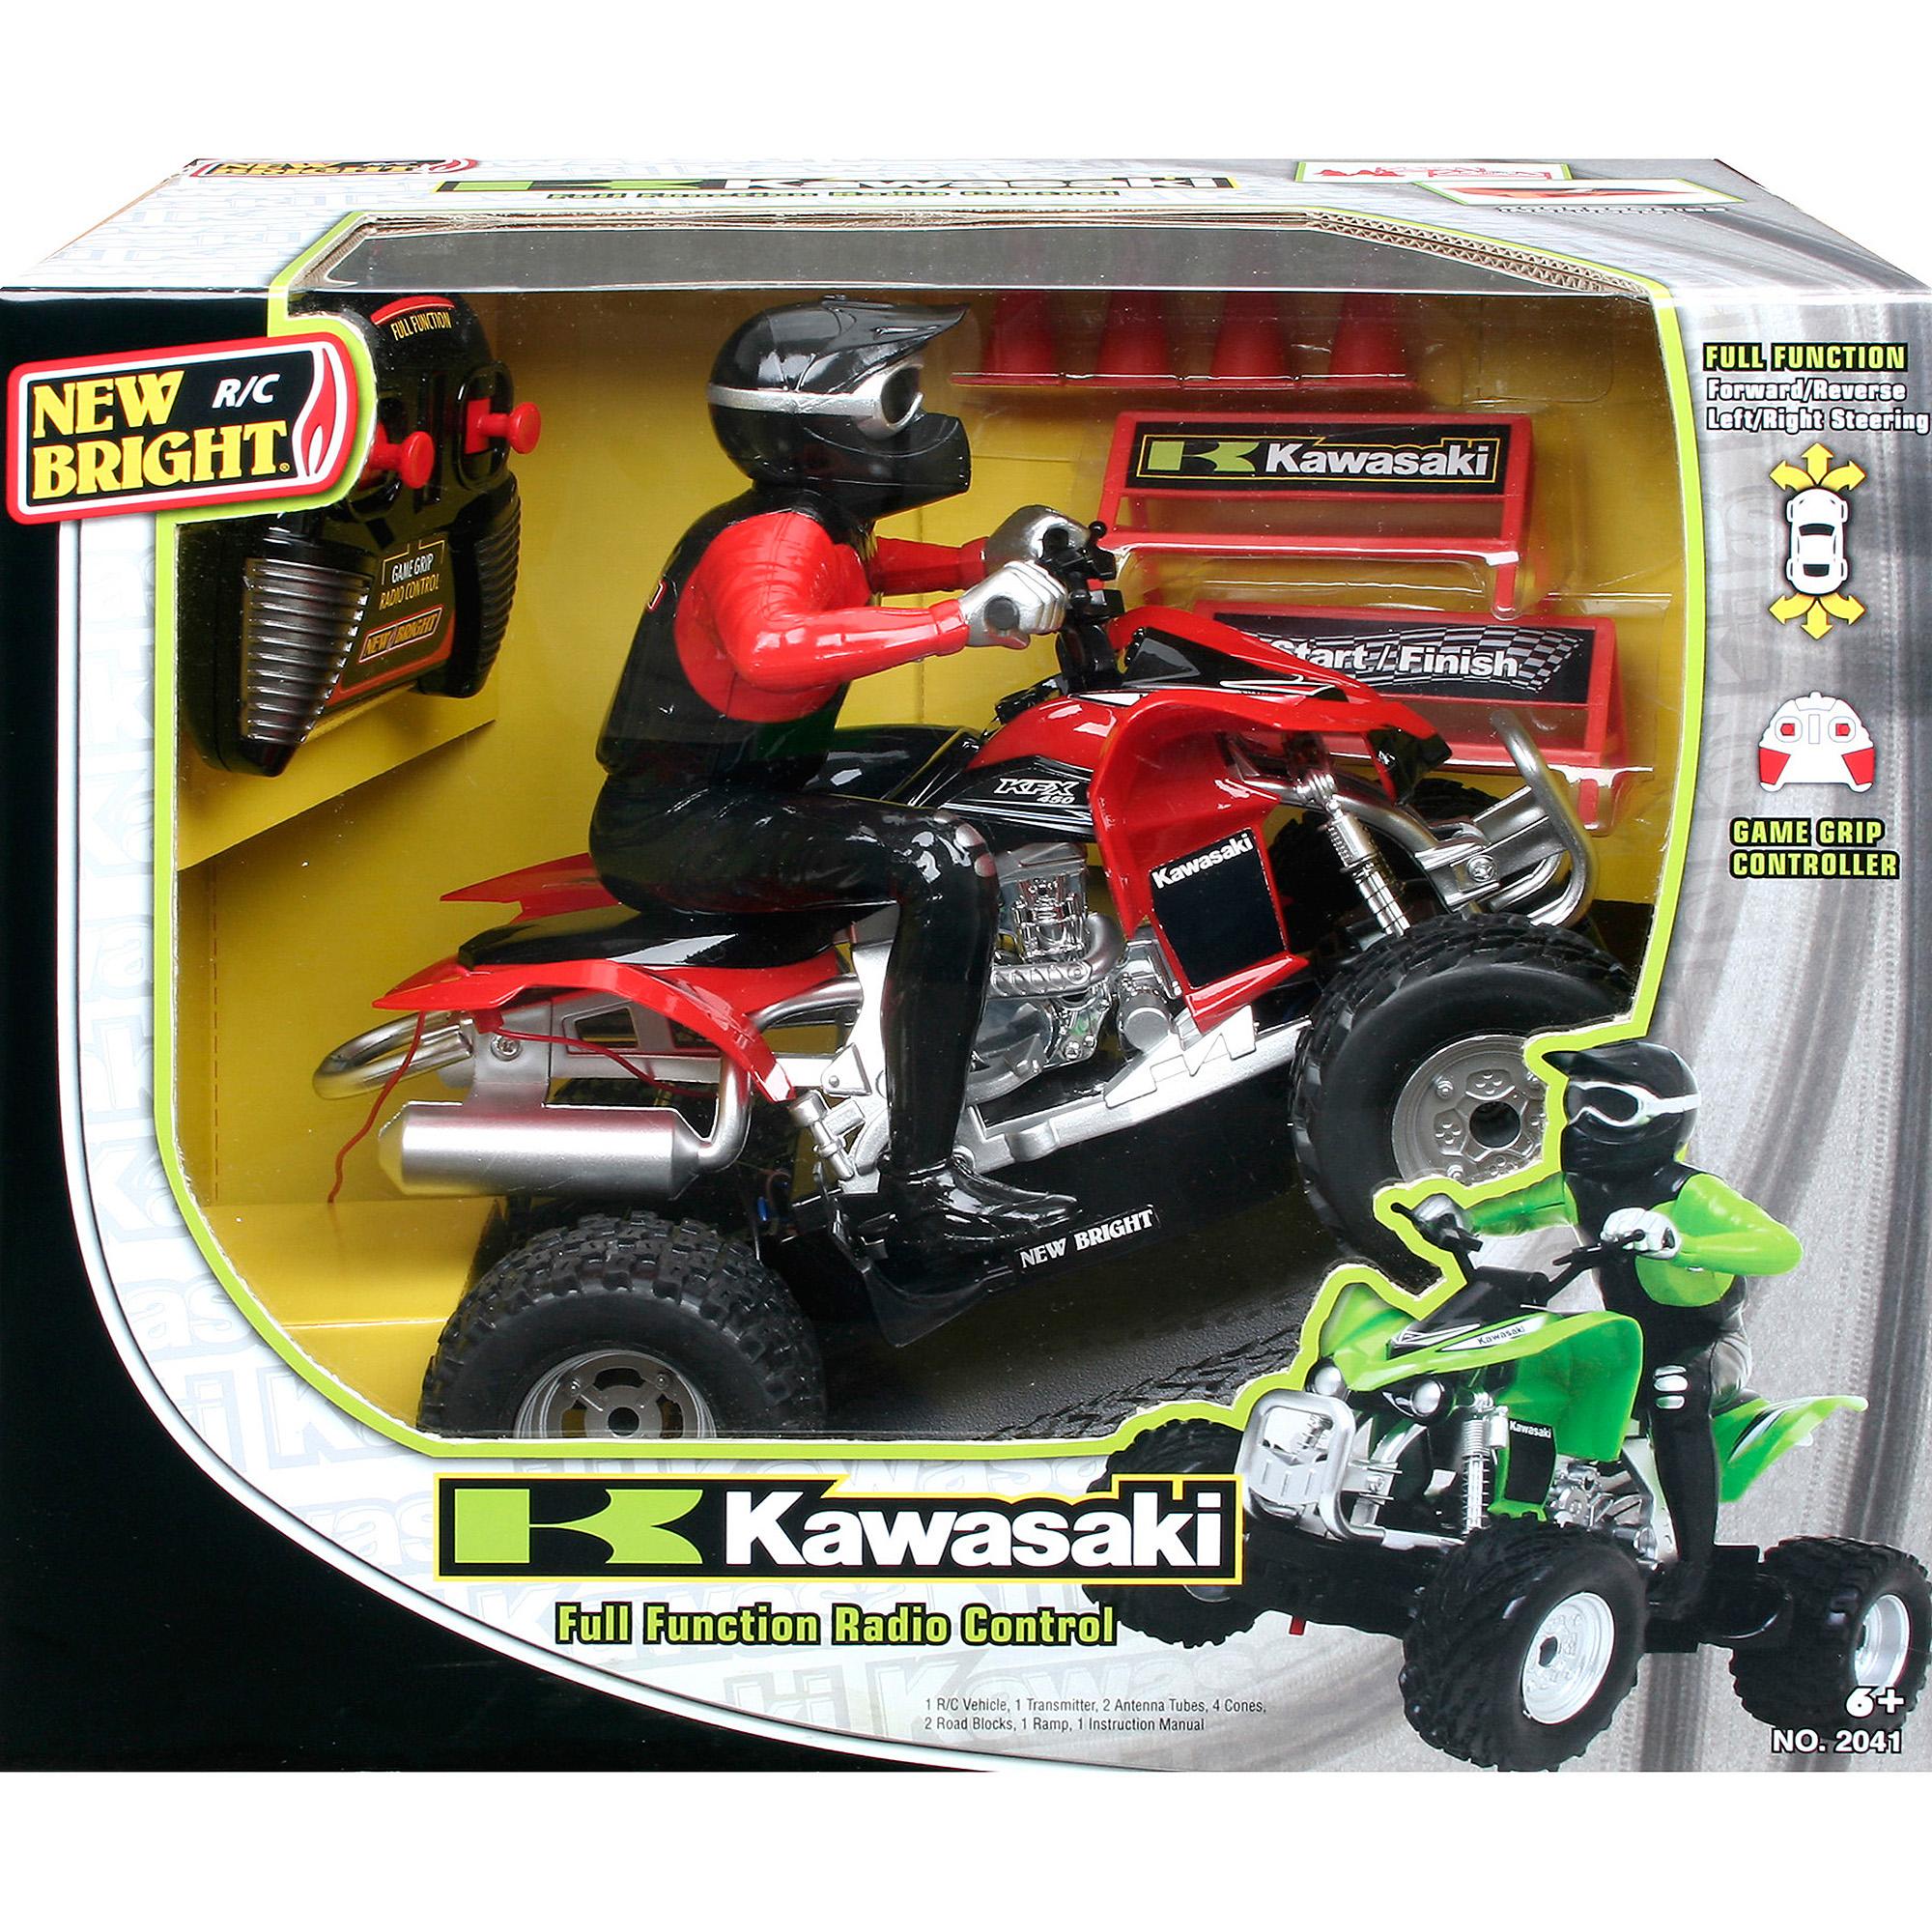 New Bright 1:20 R/C Kawasaki KFX 450 with Rider, Red